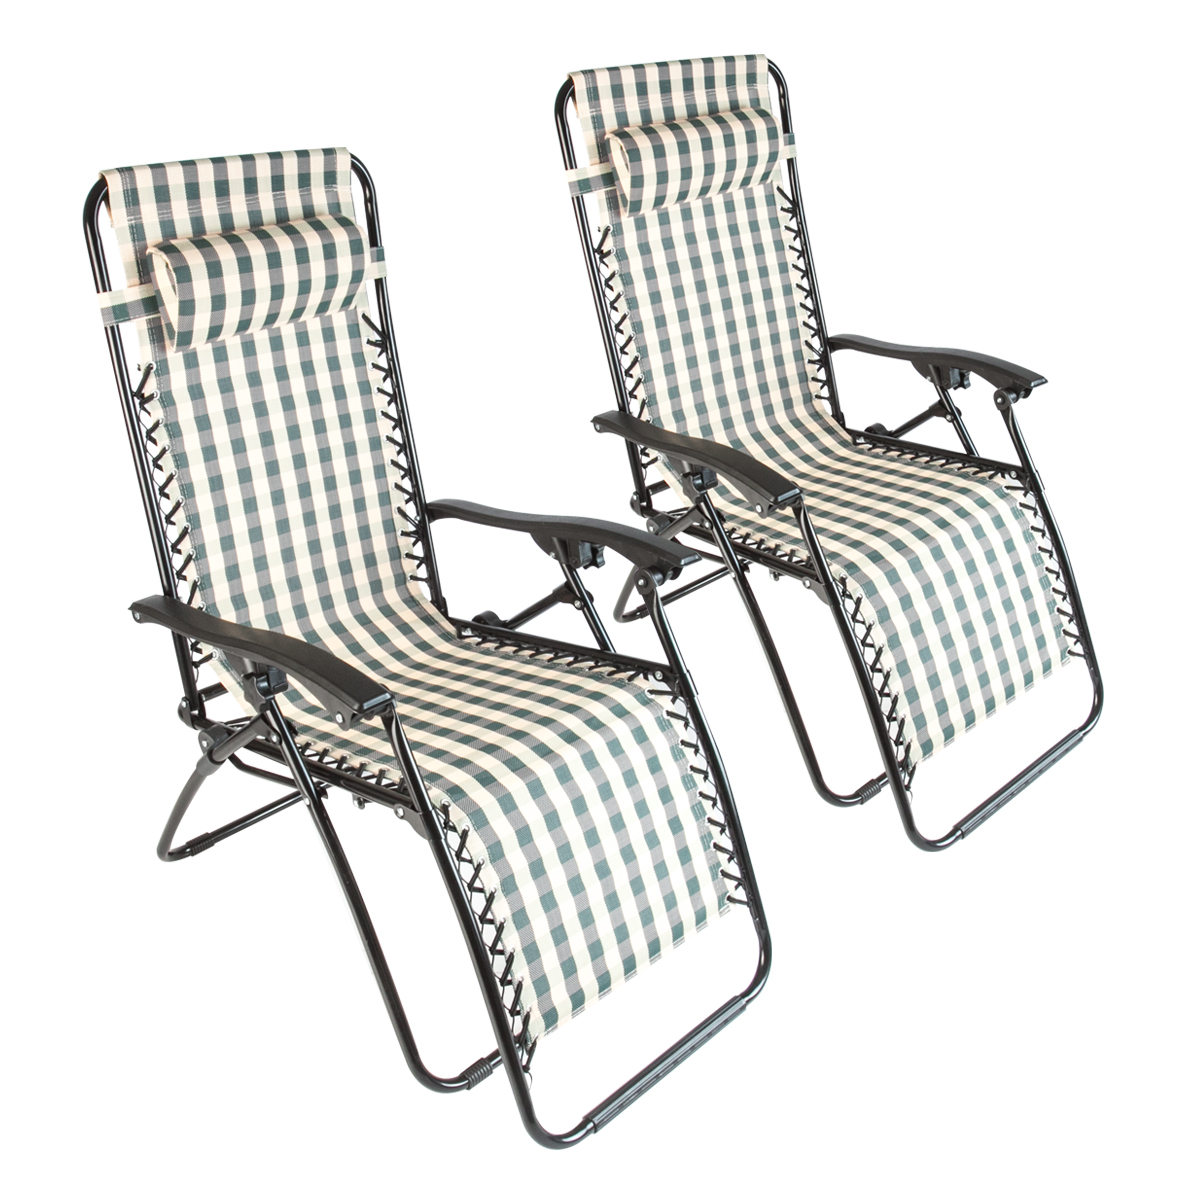 2 Beach Zero Gravity Folding Lounge Chair Recliner Patio